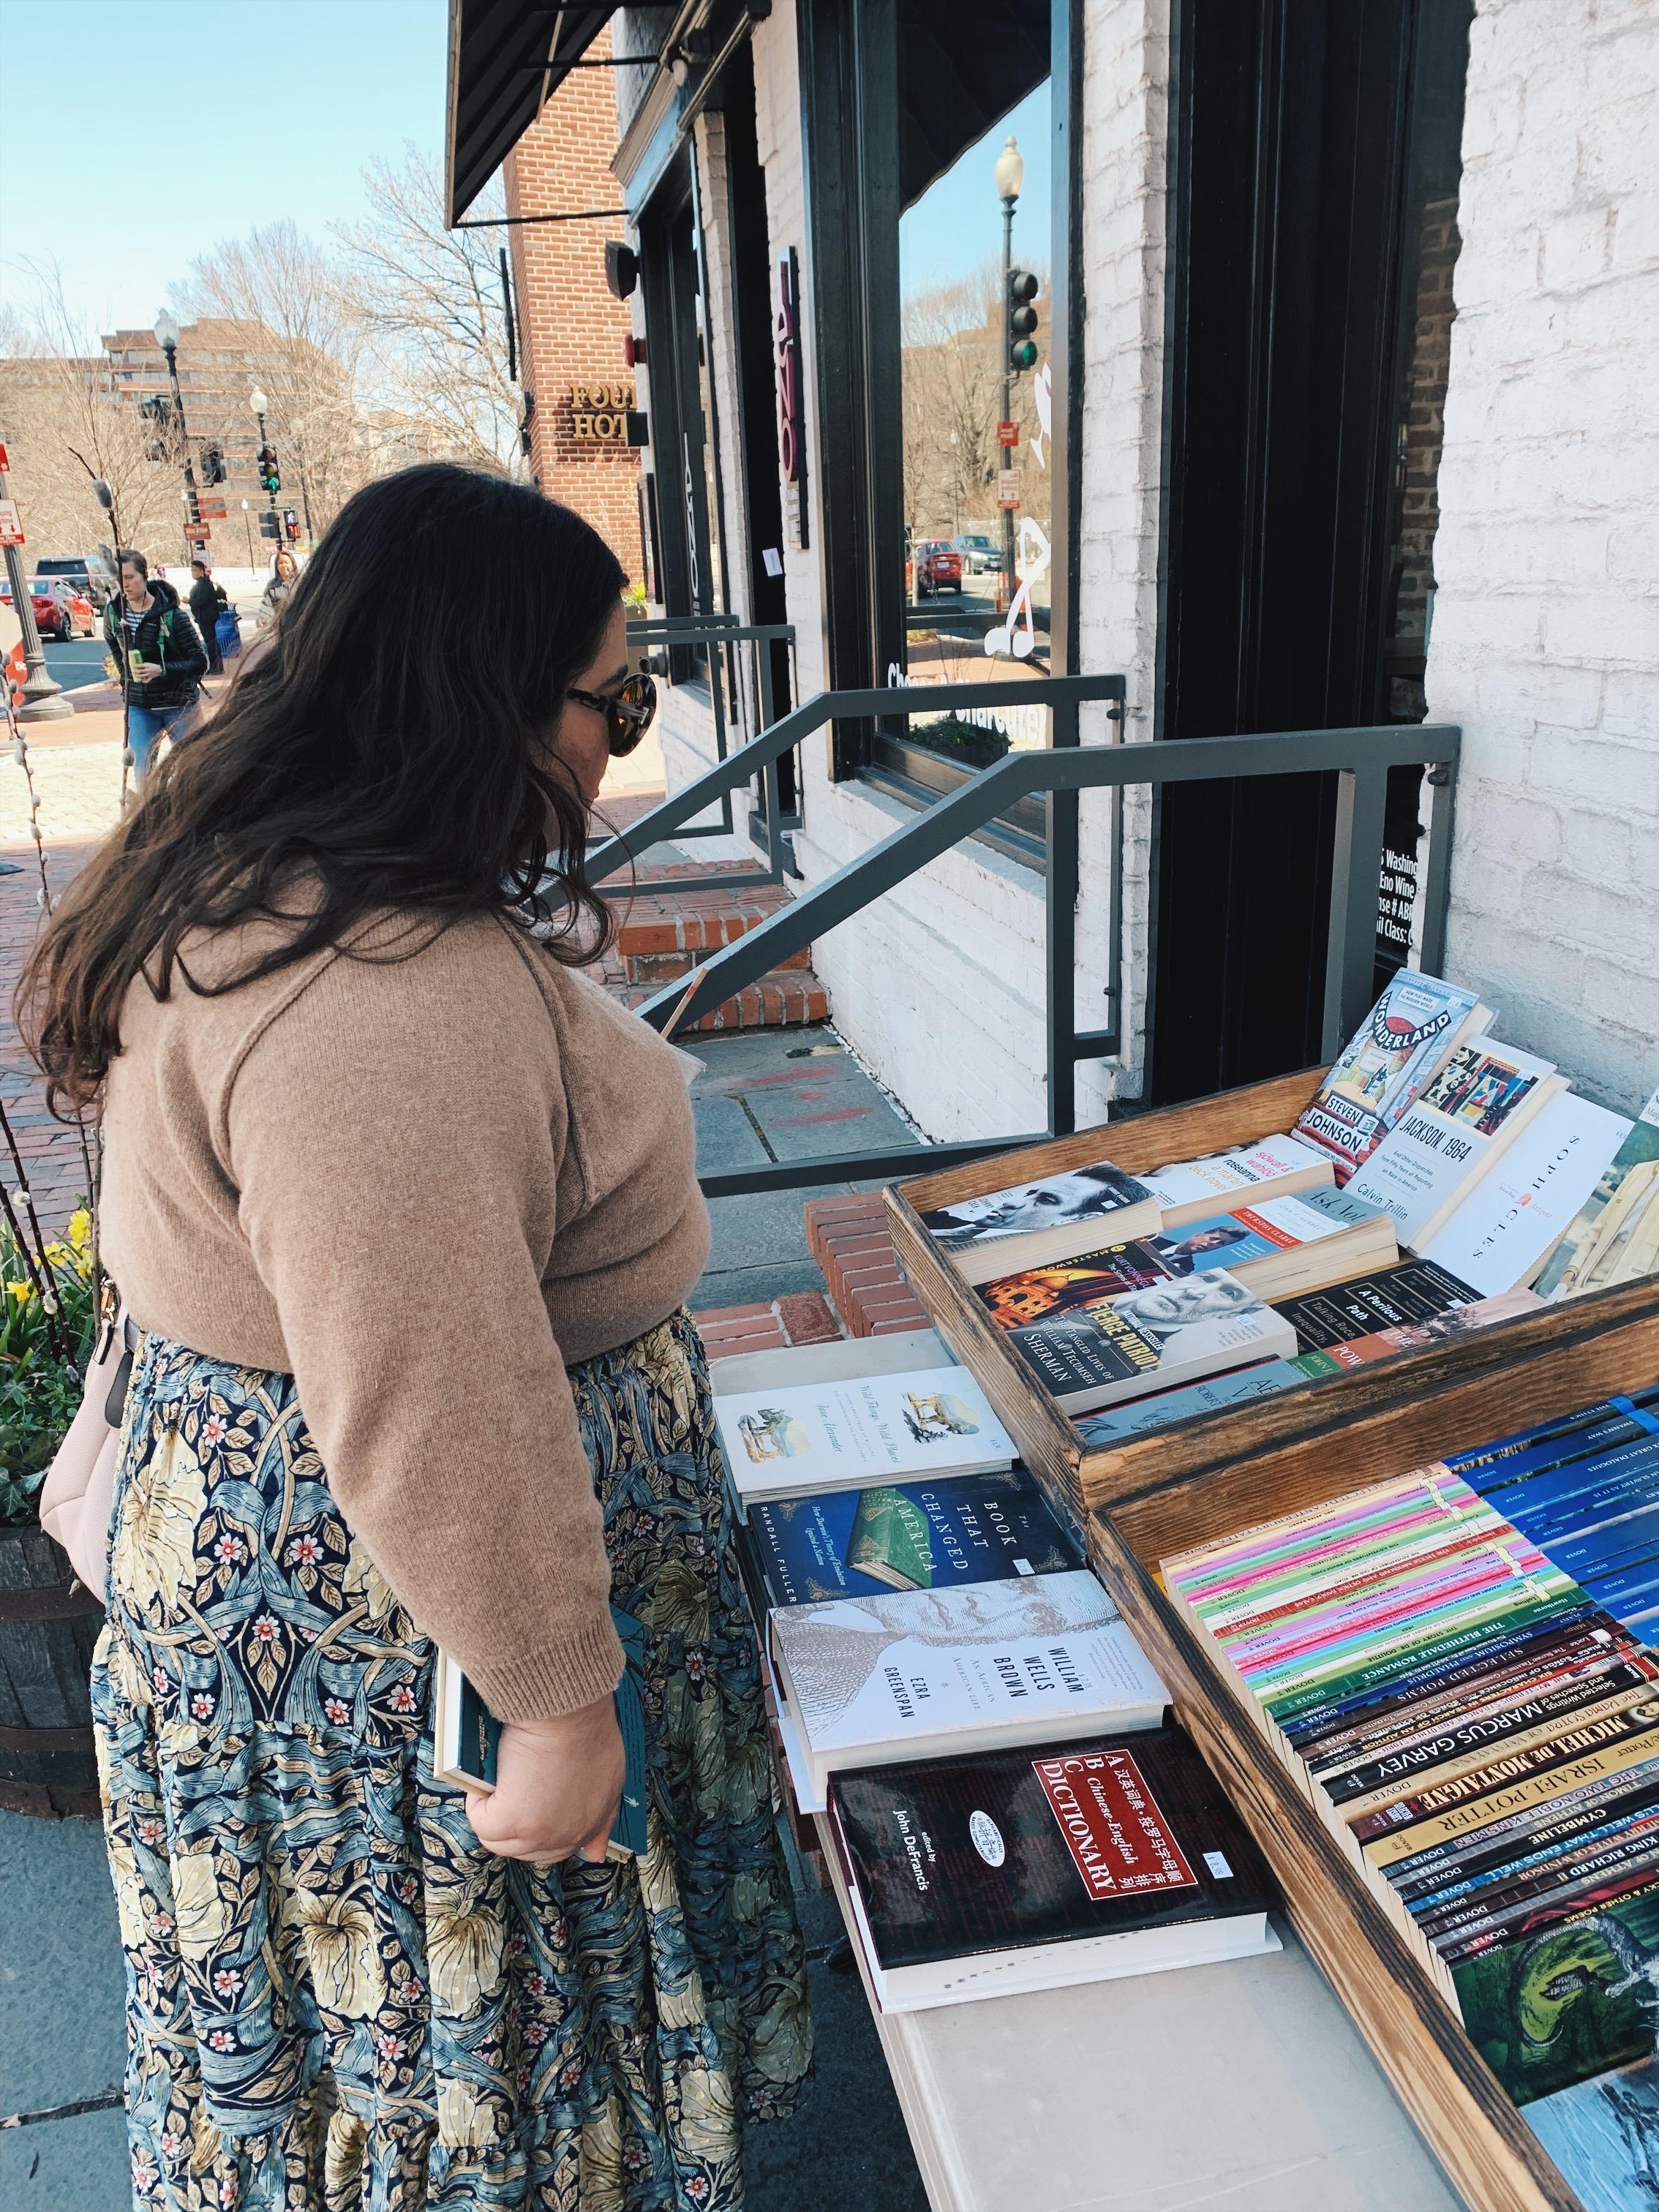 Photo featuring Raquel Reyes at Bridge Street Books from our    Washington bookshop guide    – taken by Olivia Gündüz-Willemin.